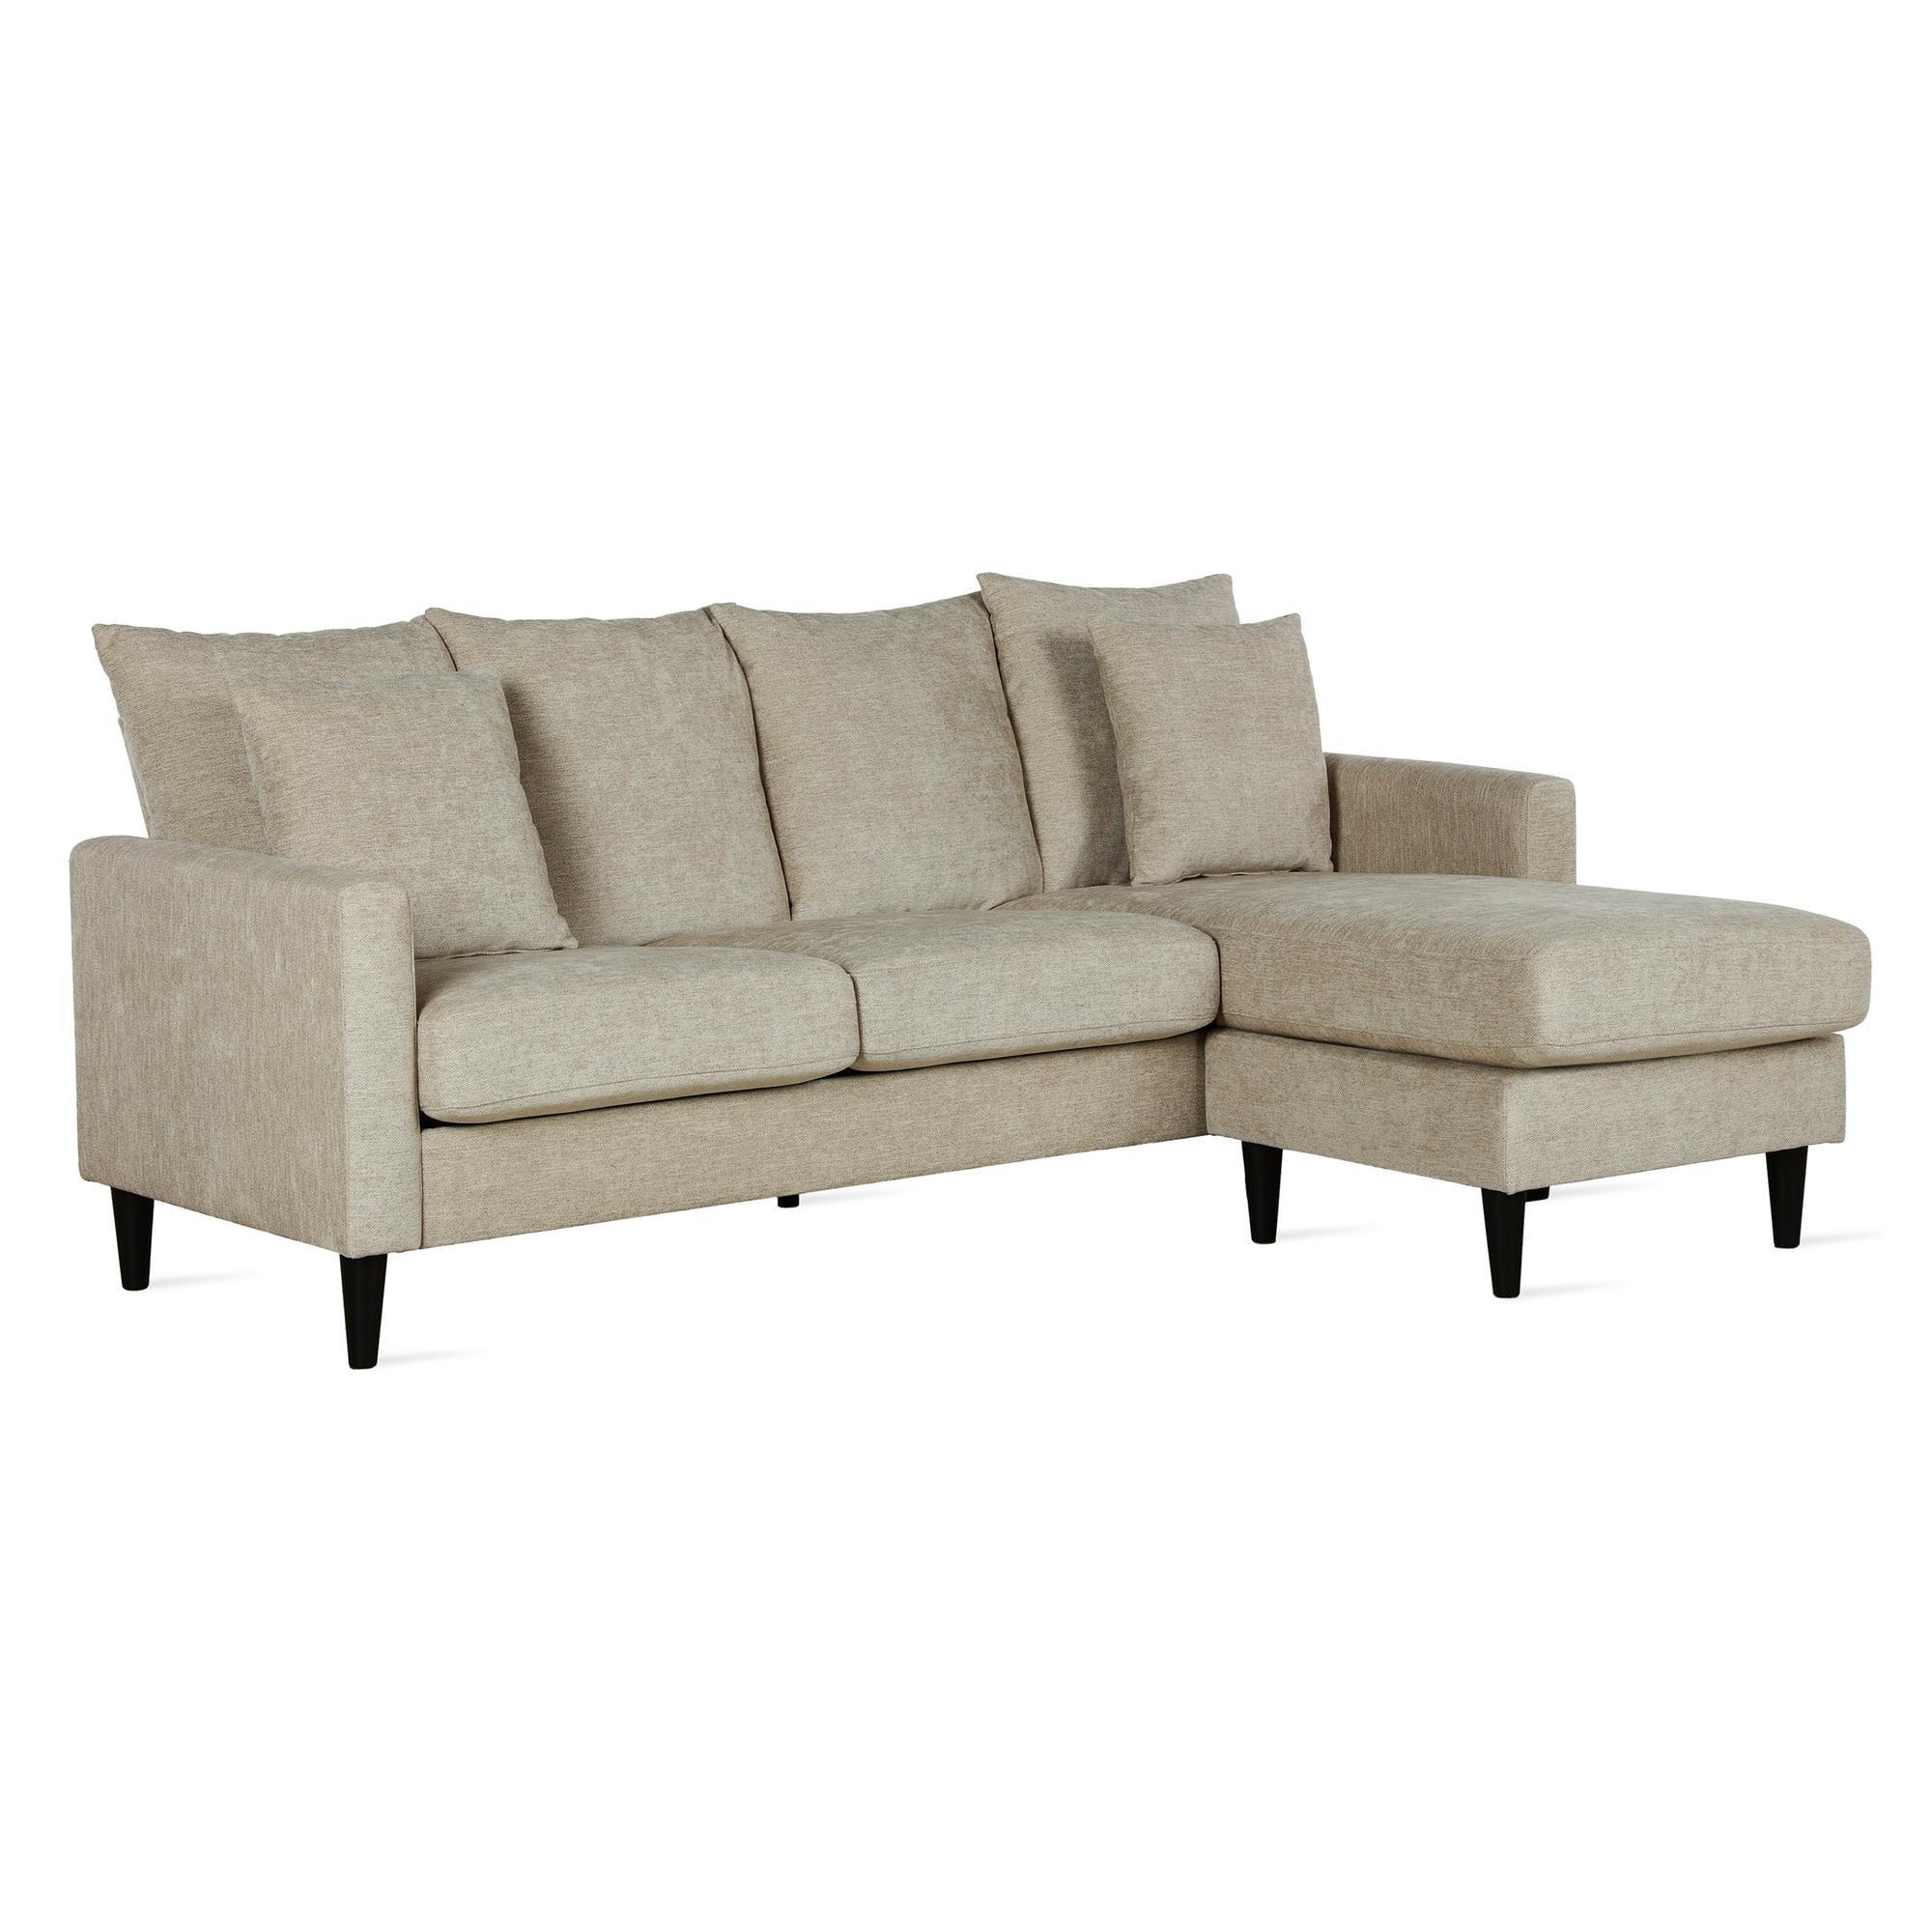 Dorel Living Keaton Reversible Sectional With Pillows Beige Walmart Com Walmart Com